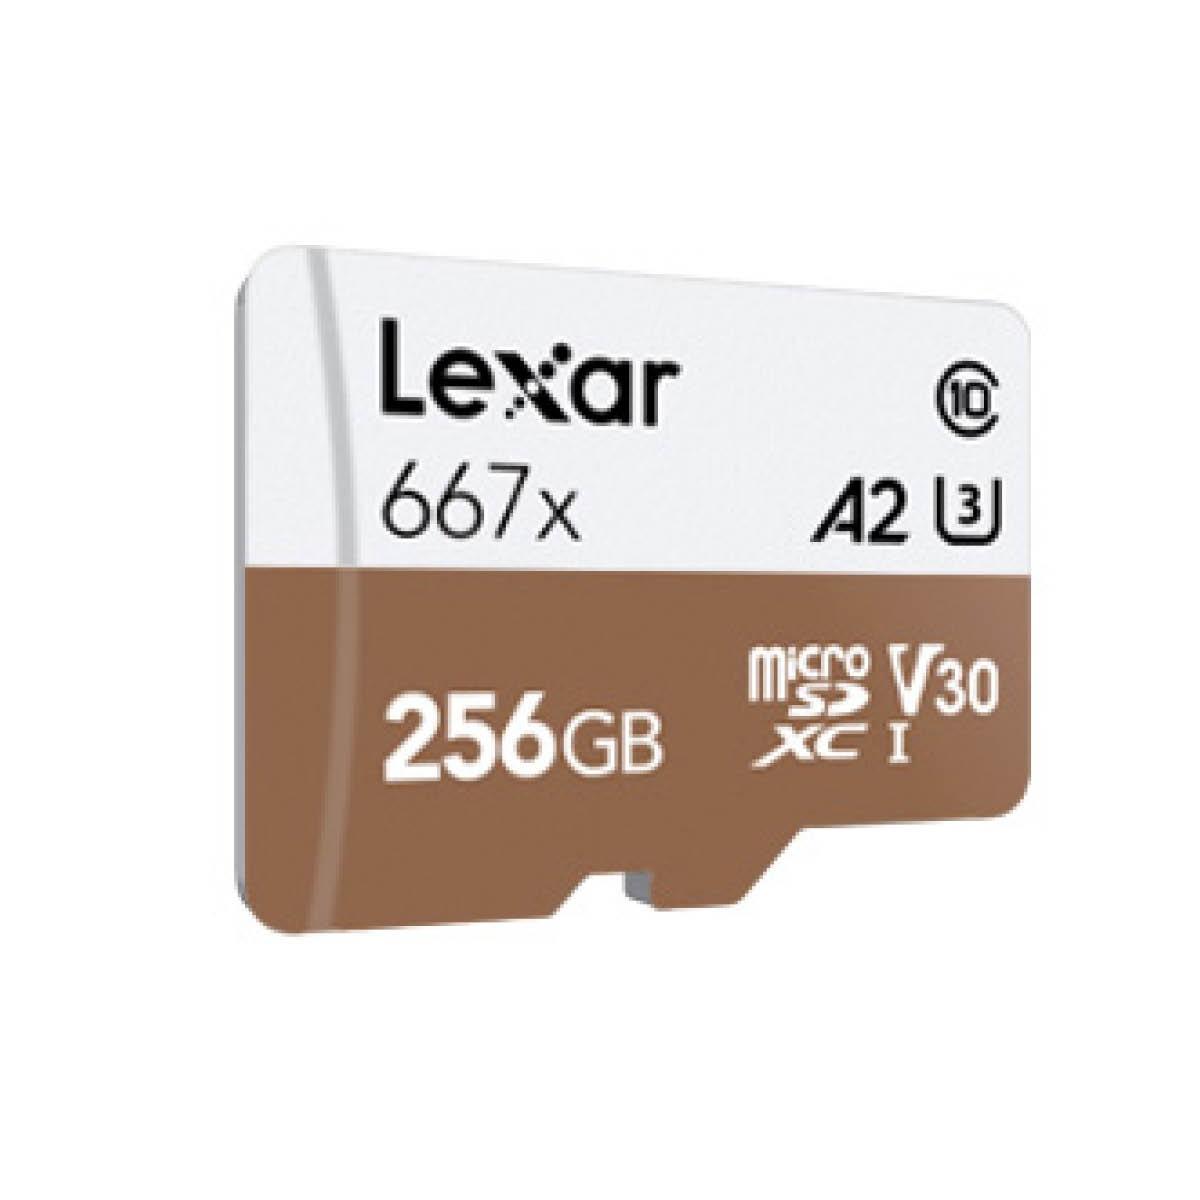 Lexar microSDXC 256GB Professional UHS-I 667x